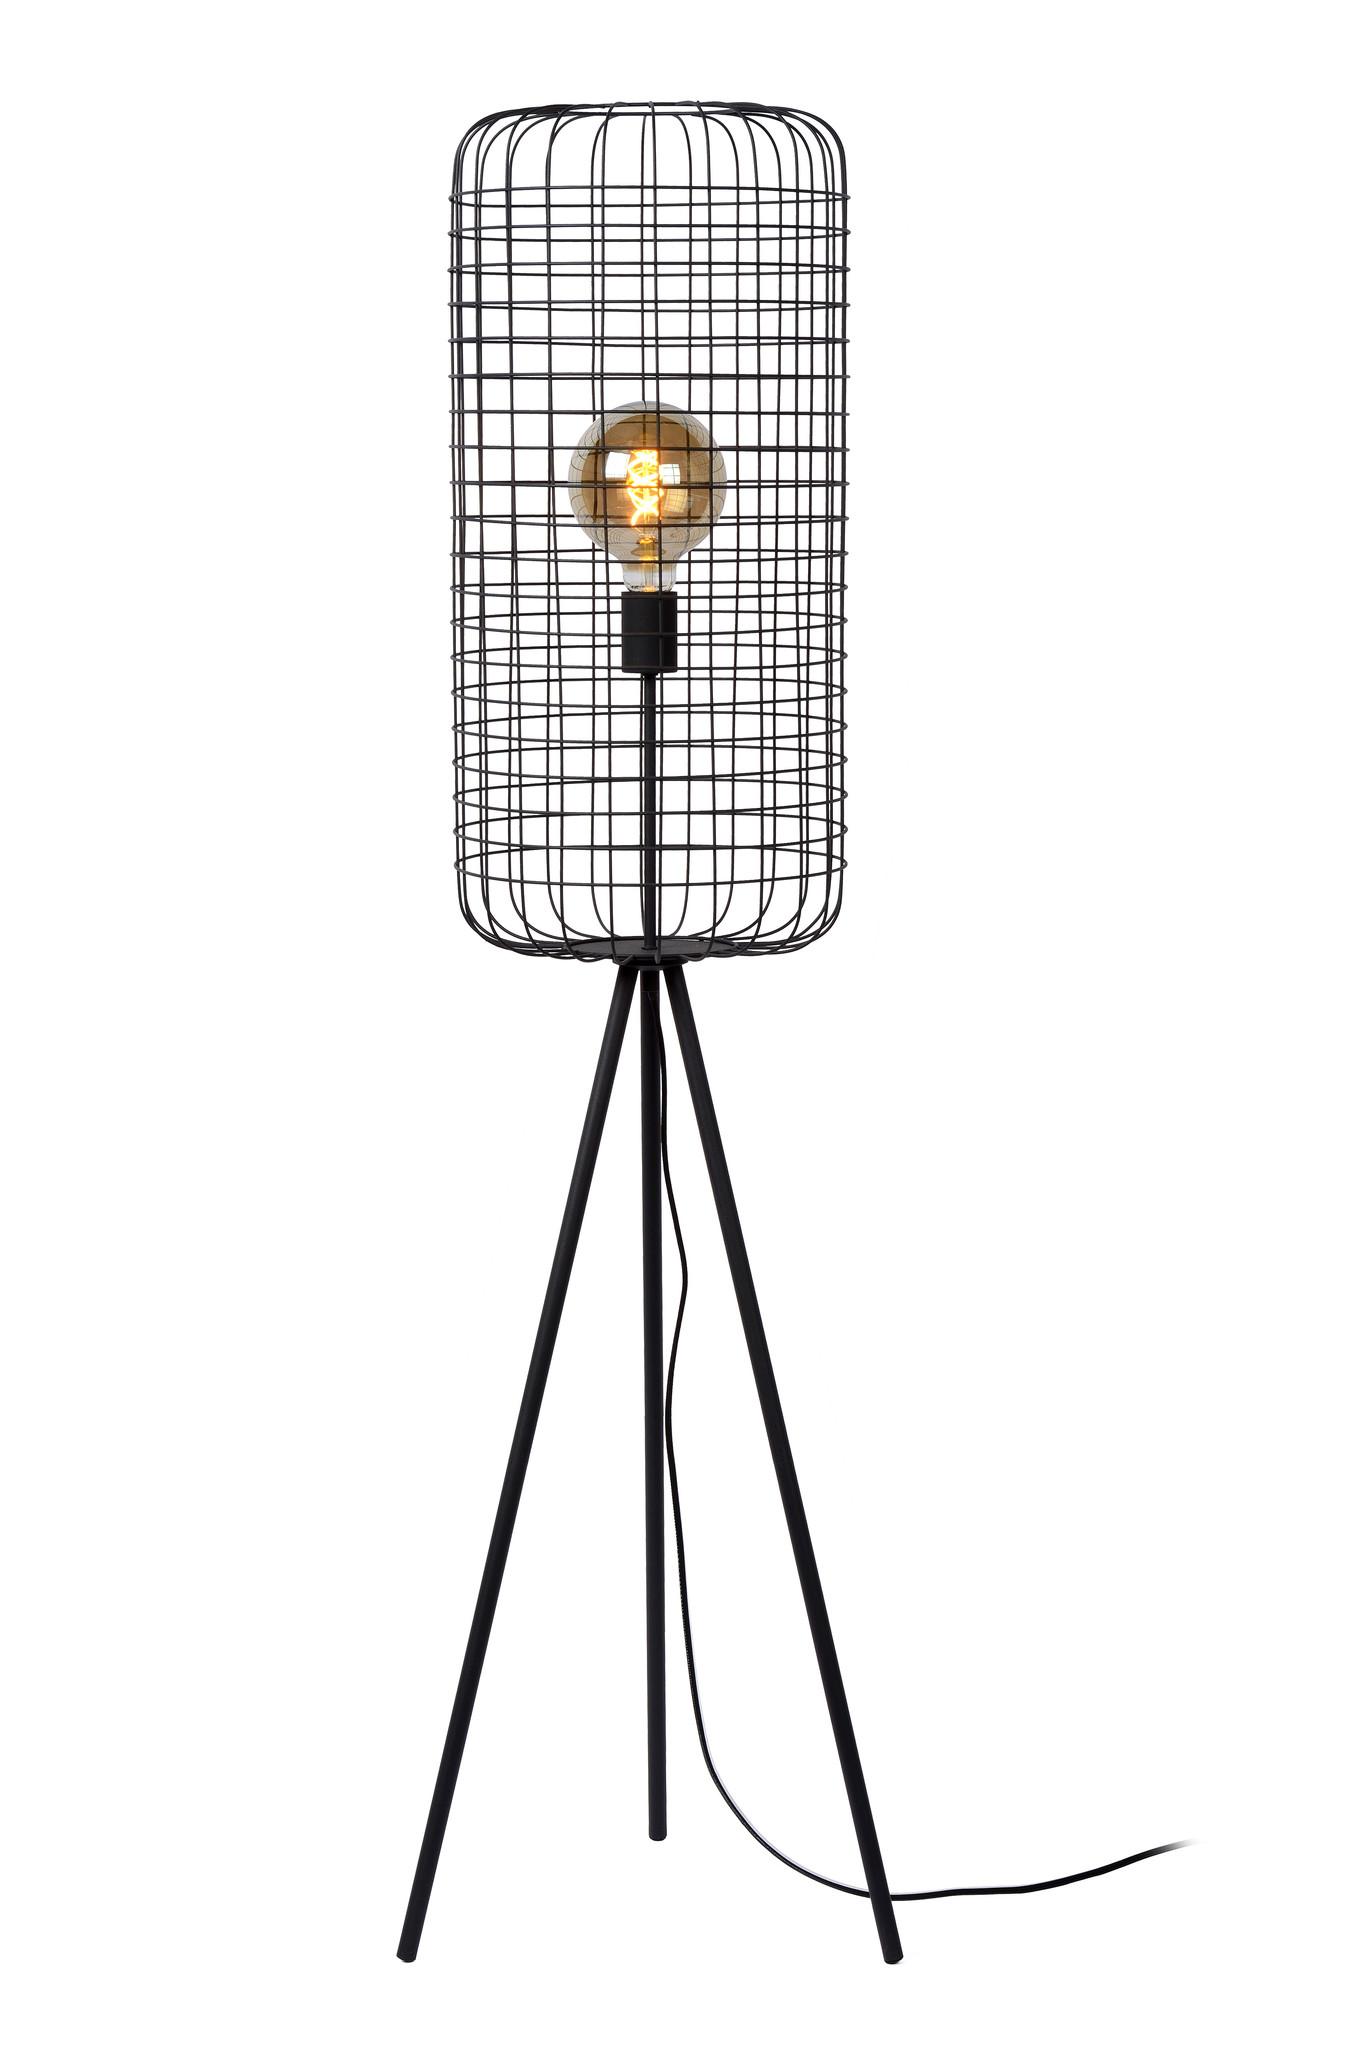 Vloerlamp Esmee Zwart 31cm Ø |  | 5411212021939